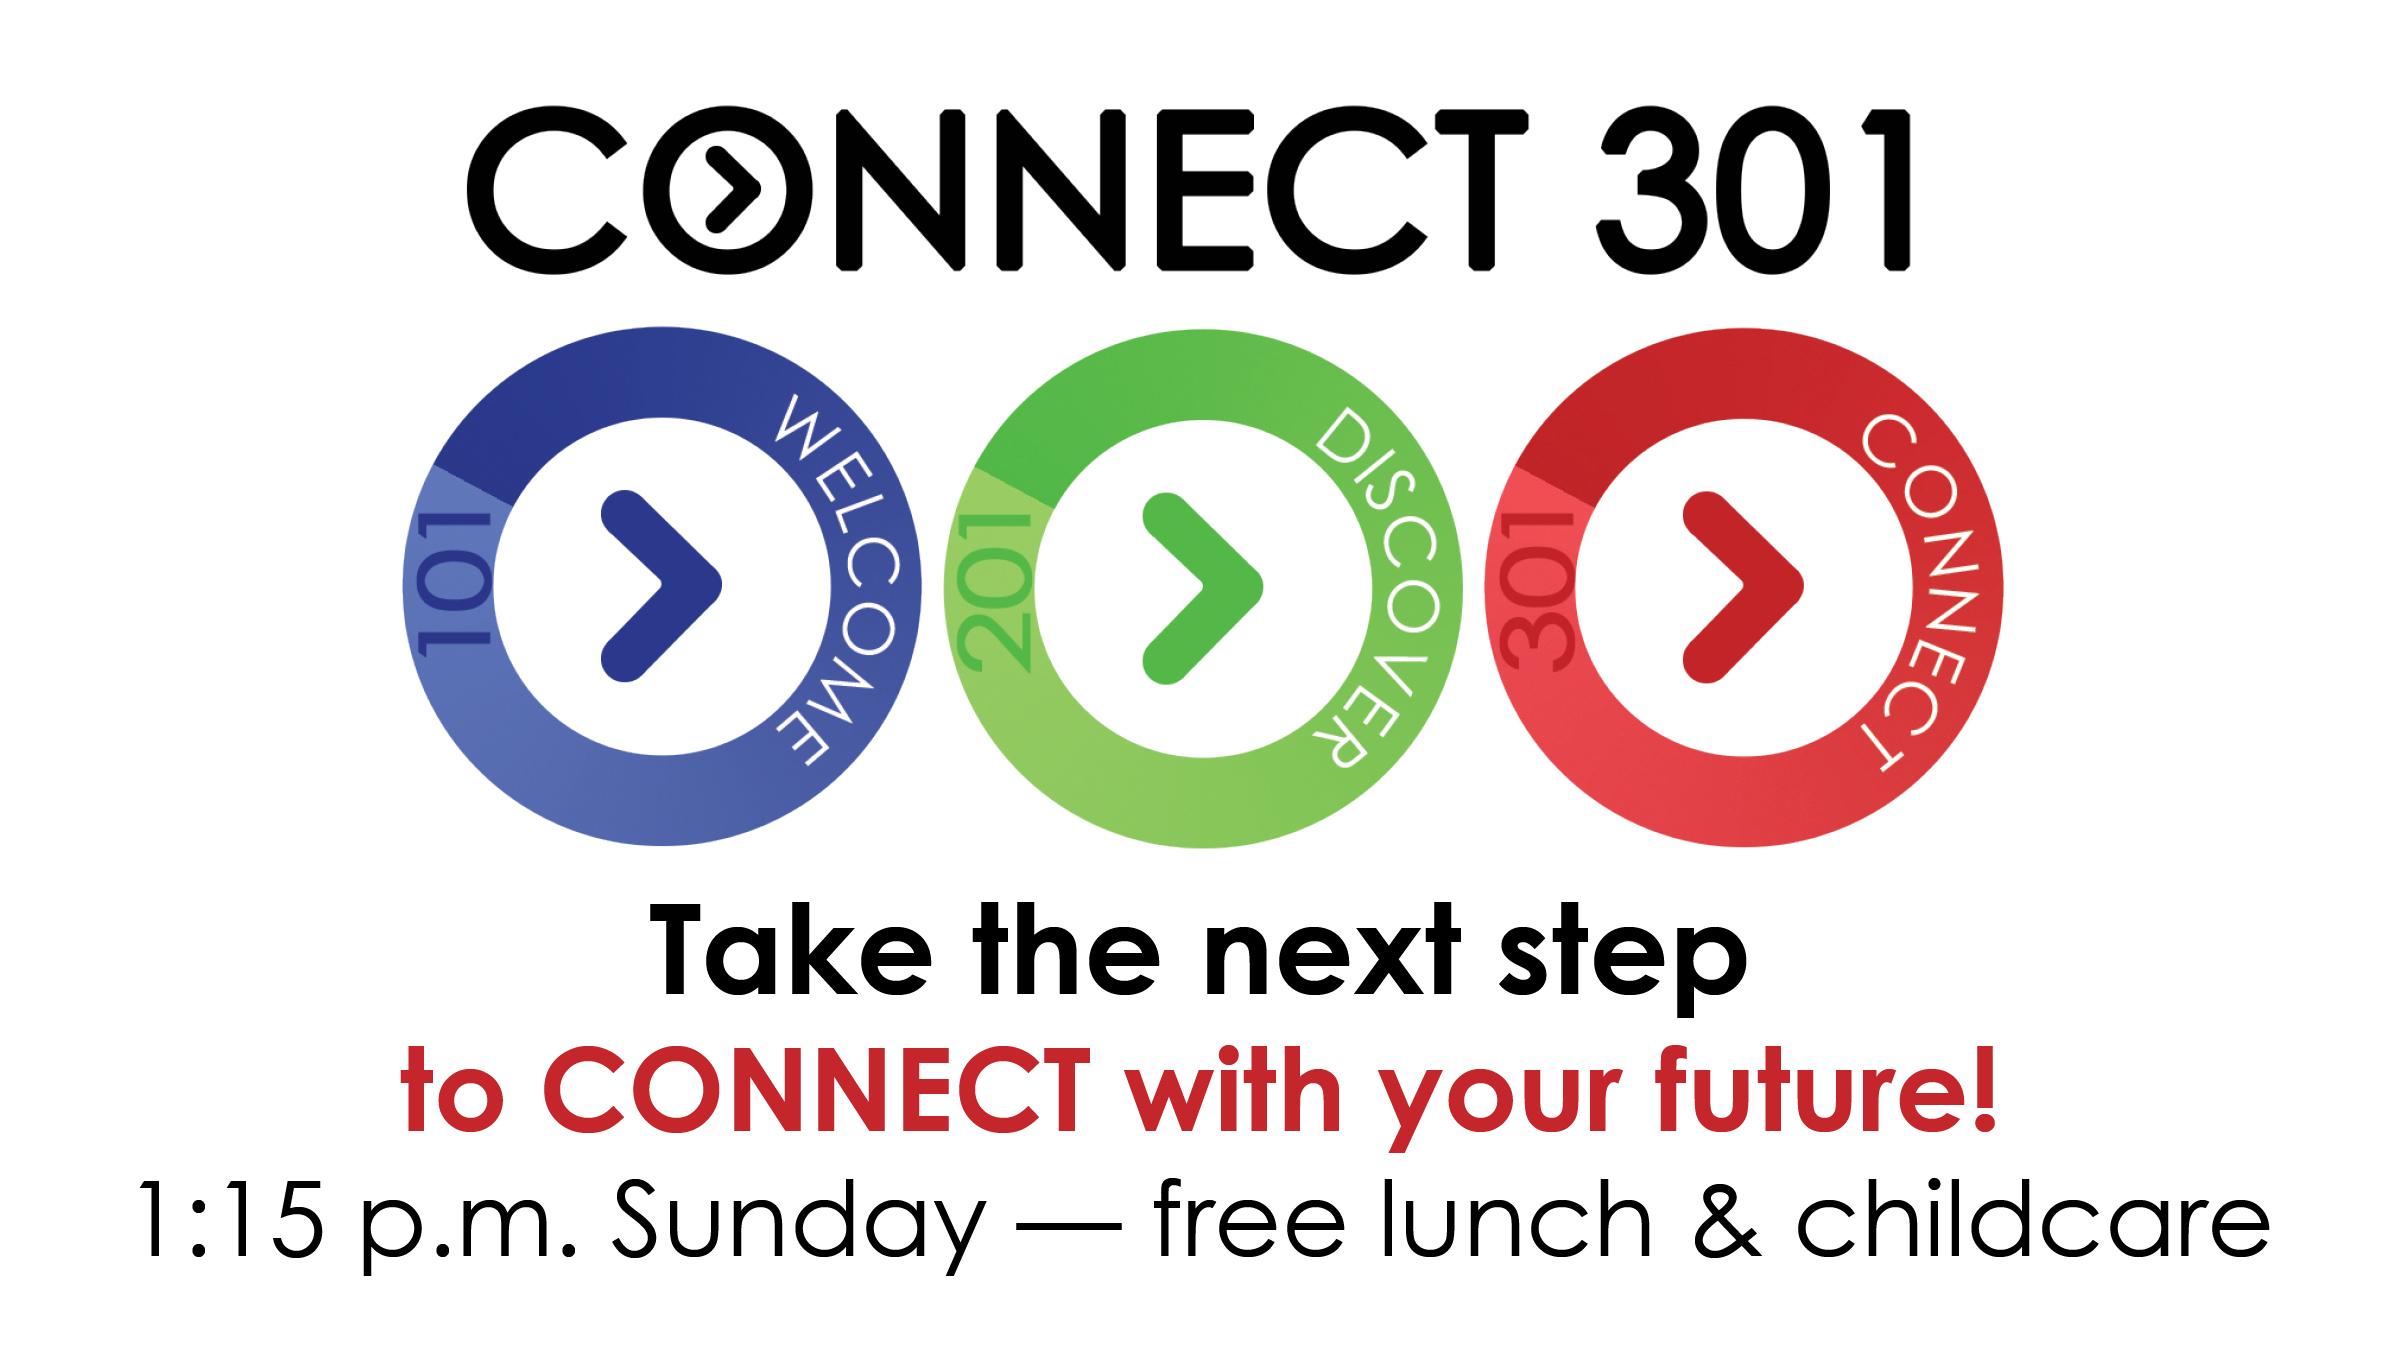 SunConnect301